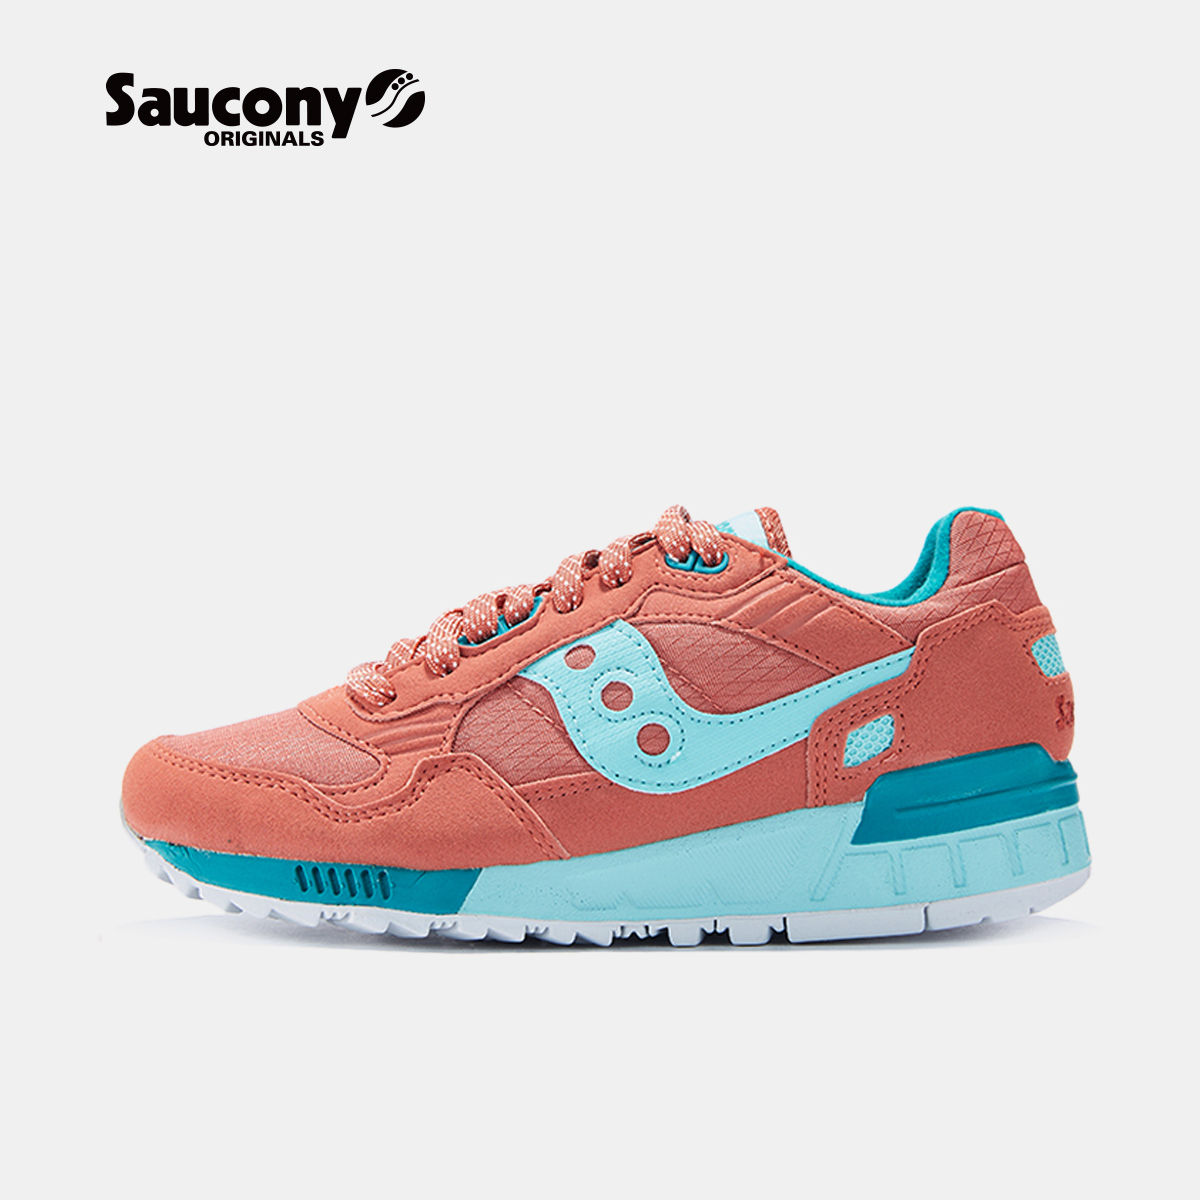 Saucony圣康尼 SHADOW 5000轻便复古跑步鞋运动鞋女S60033-105